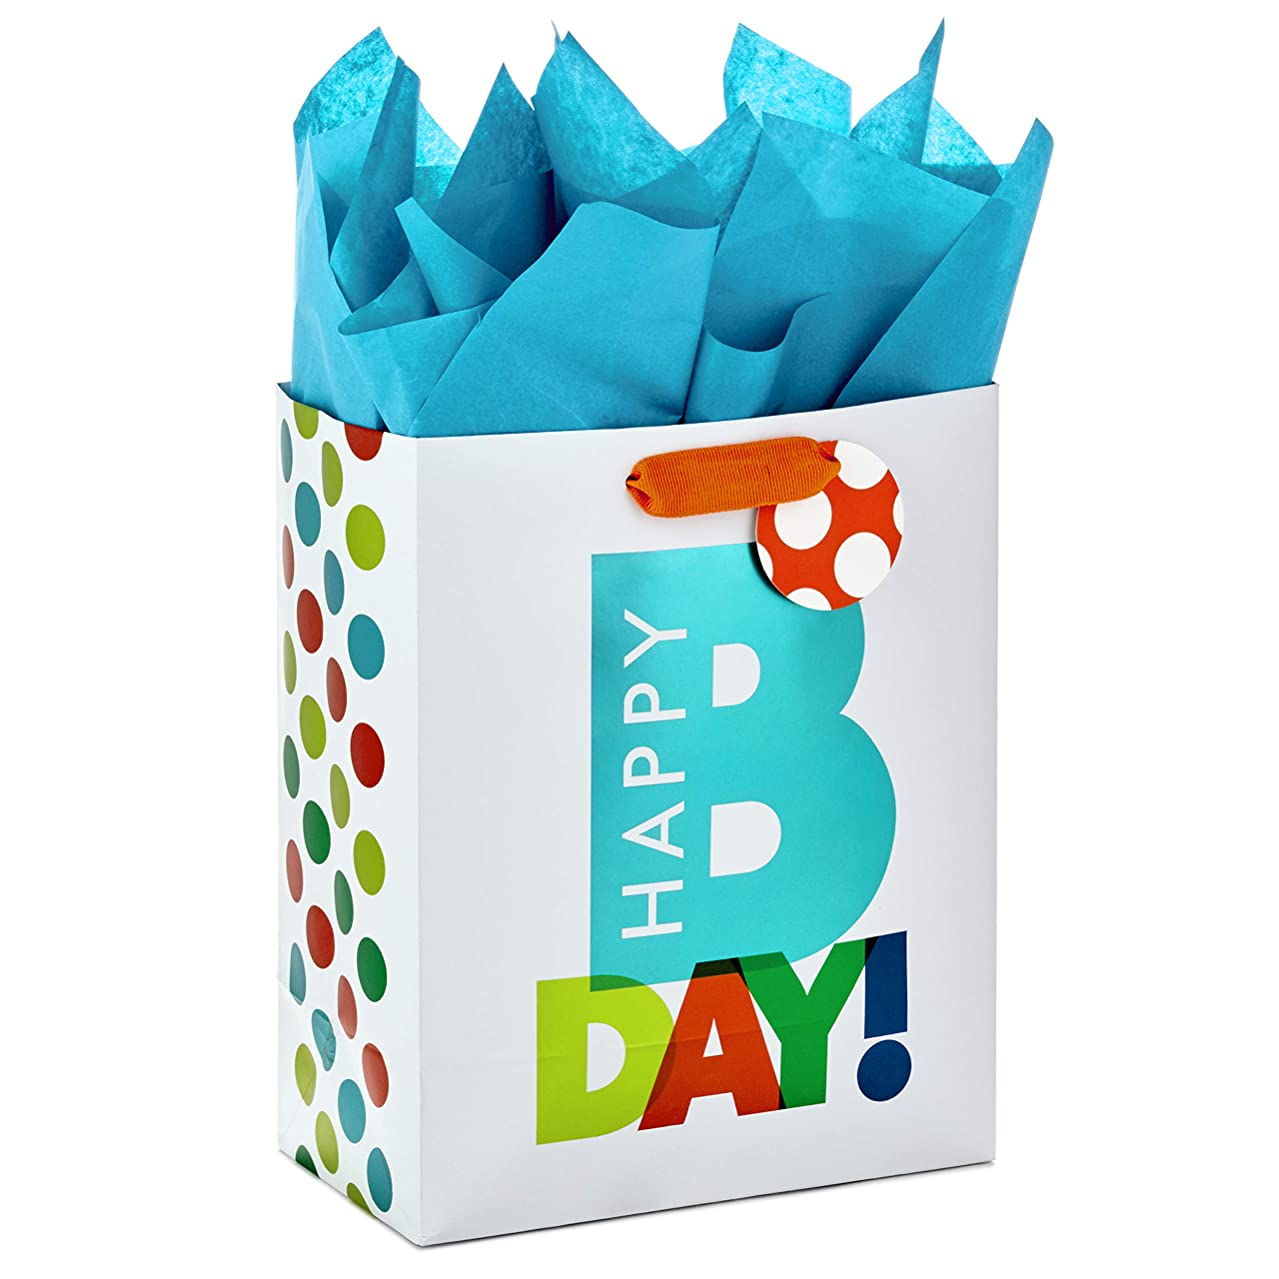 Hallmark Medium Gift Bag with Tissue Paper for Birthdays (Happy Bday)